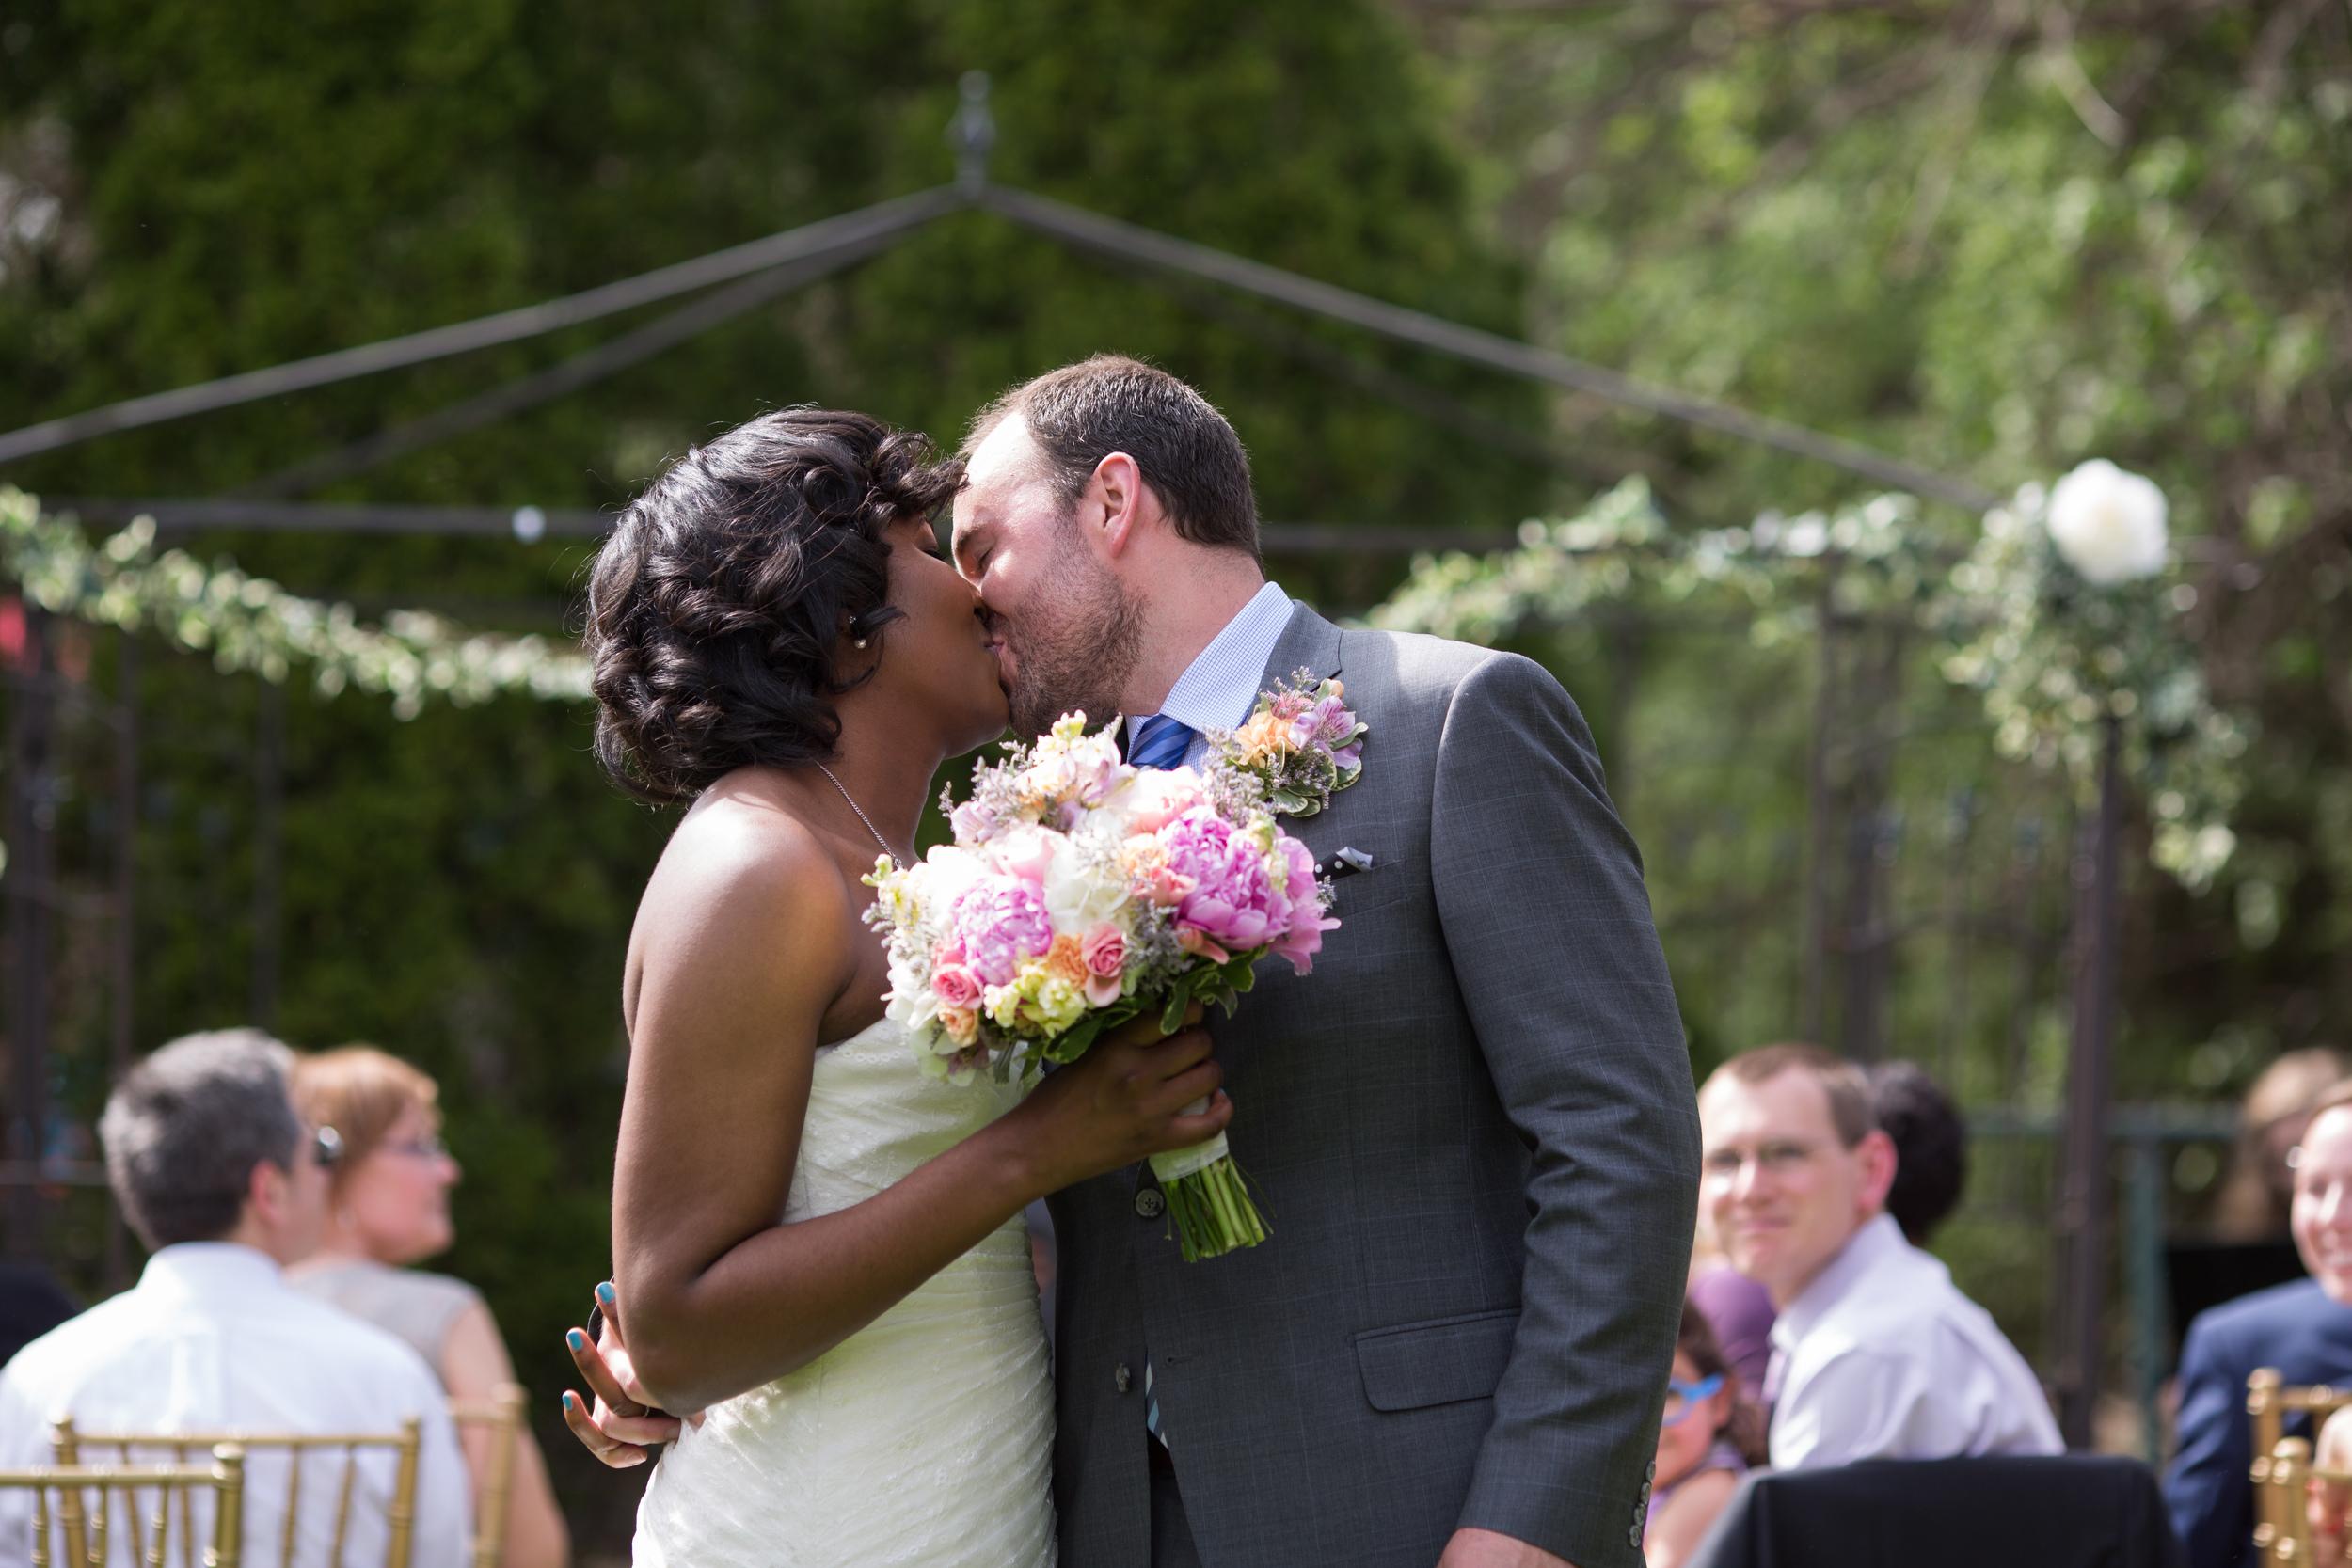 ann_arbor_weddings_007.JPG